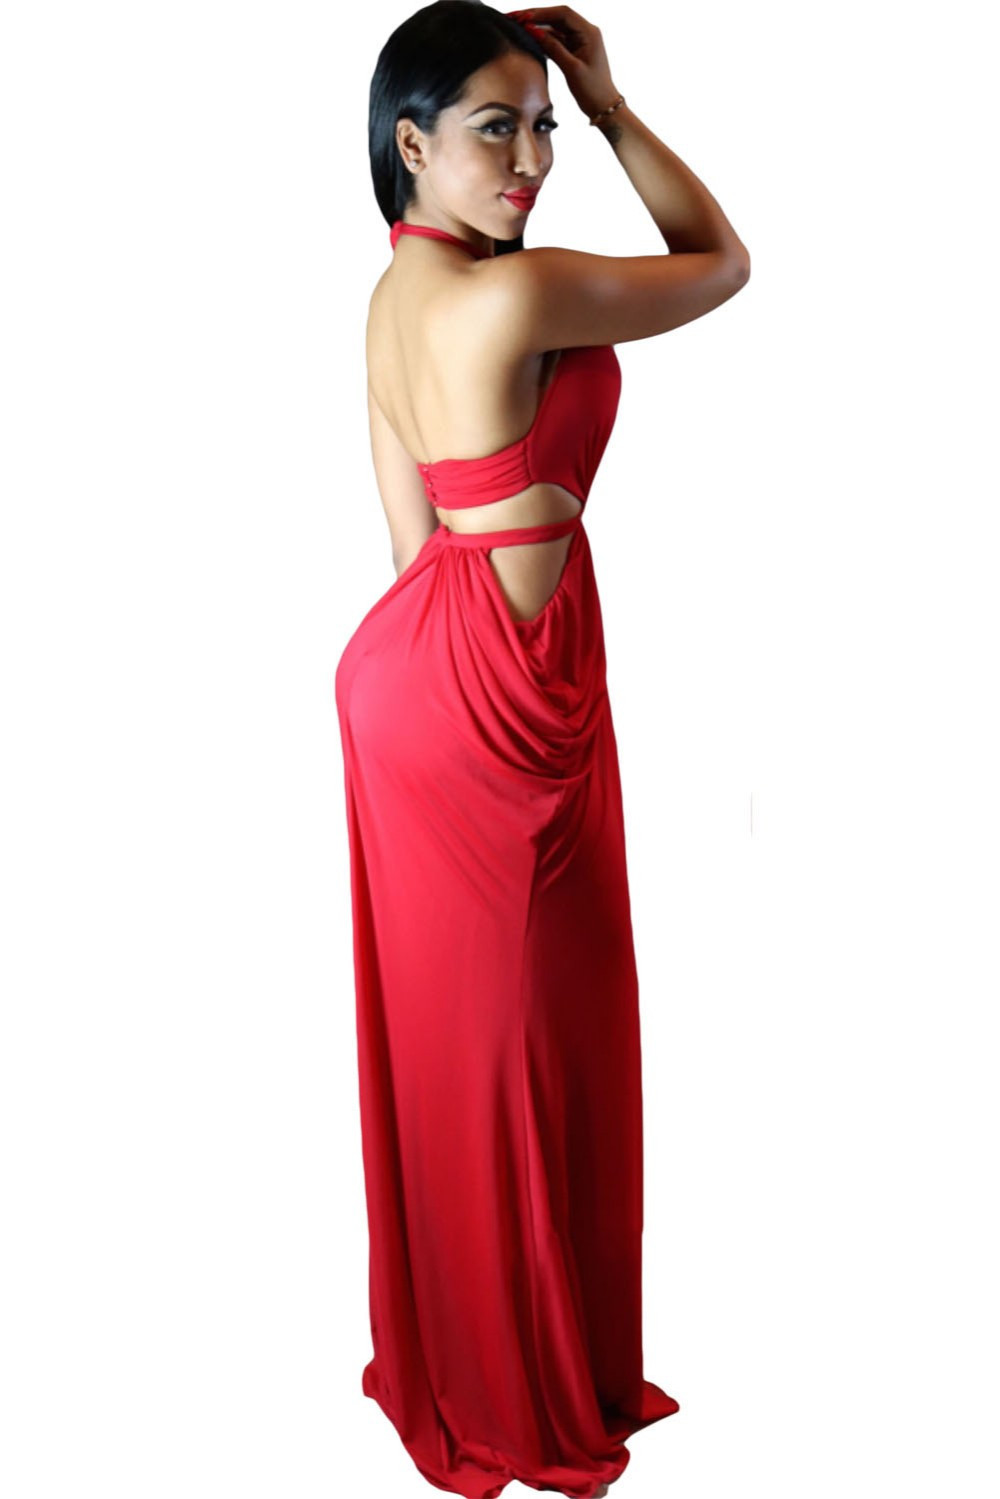 Draped Halter club dresses  at Bling Brides Bouquet - Online Bridal store image 5